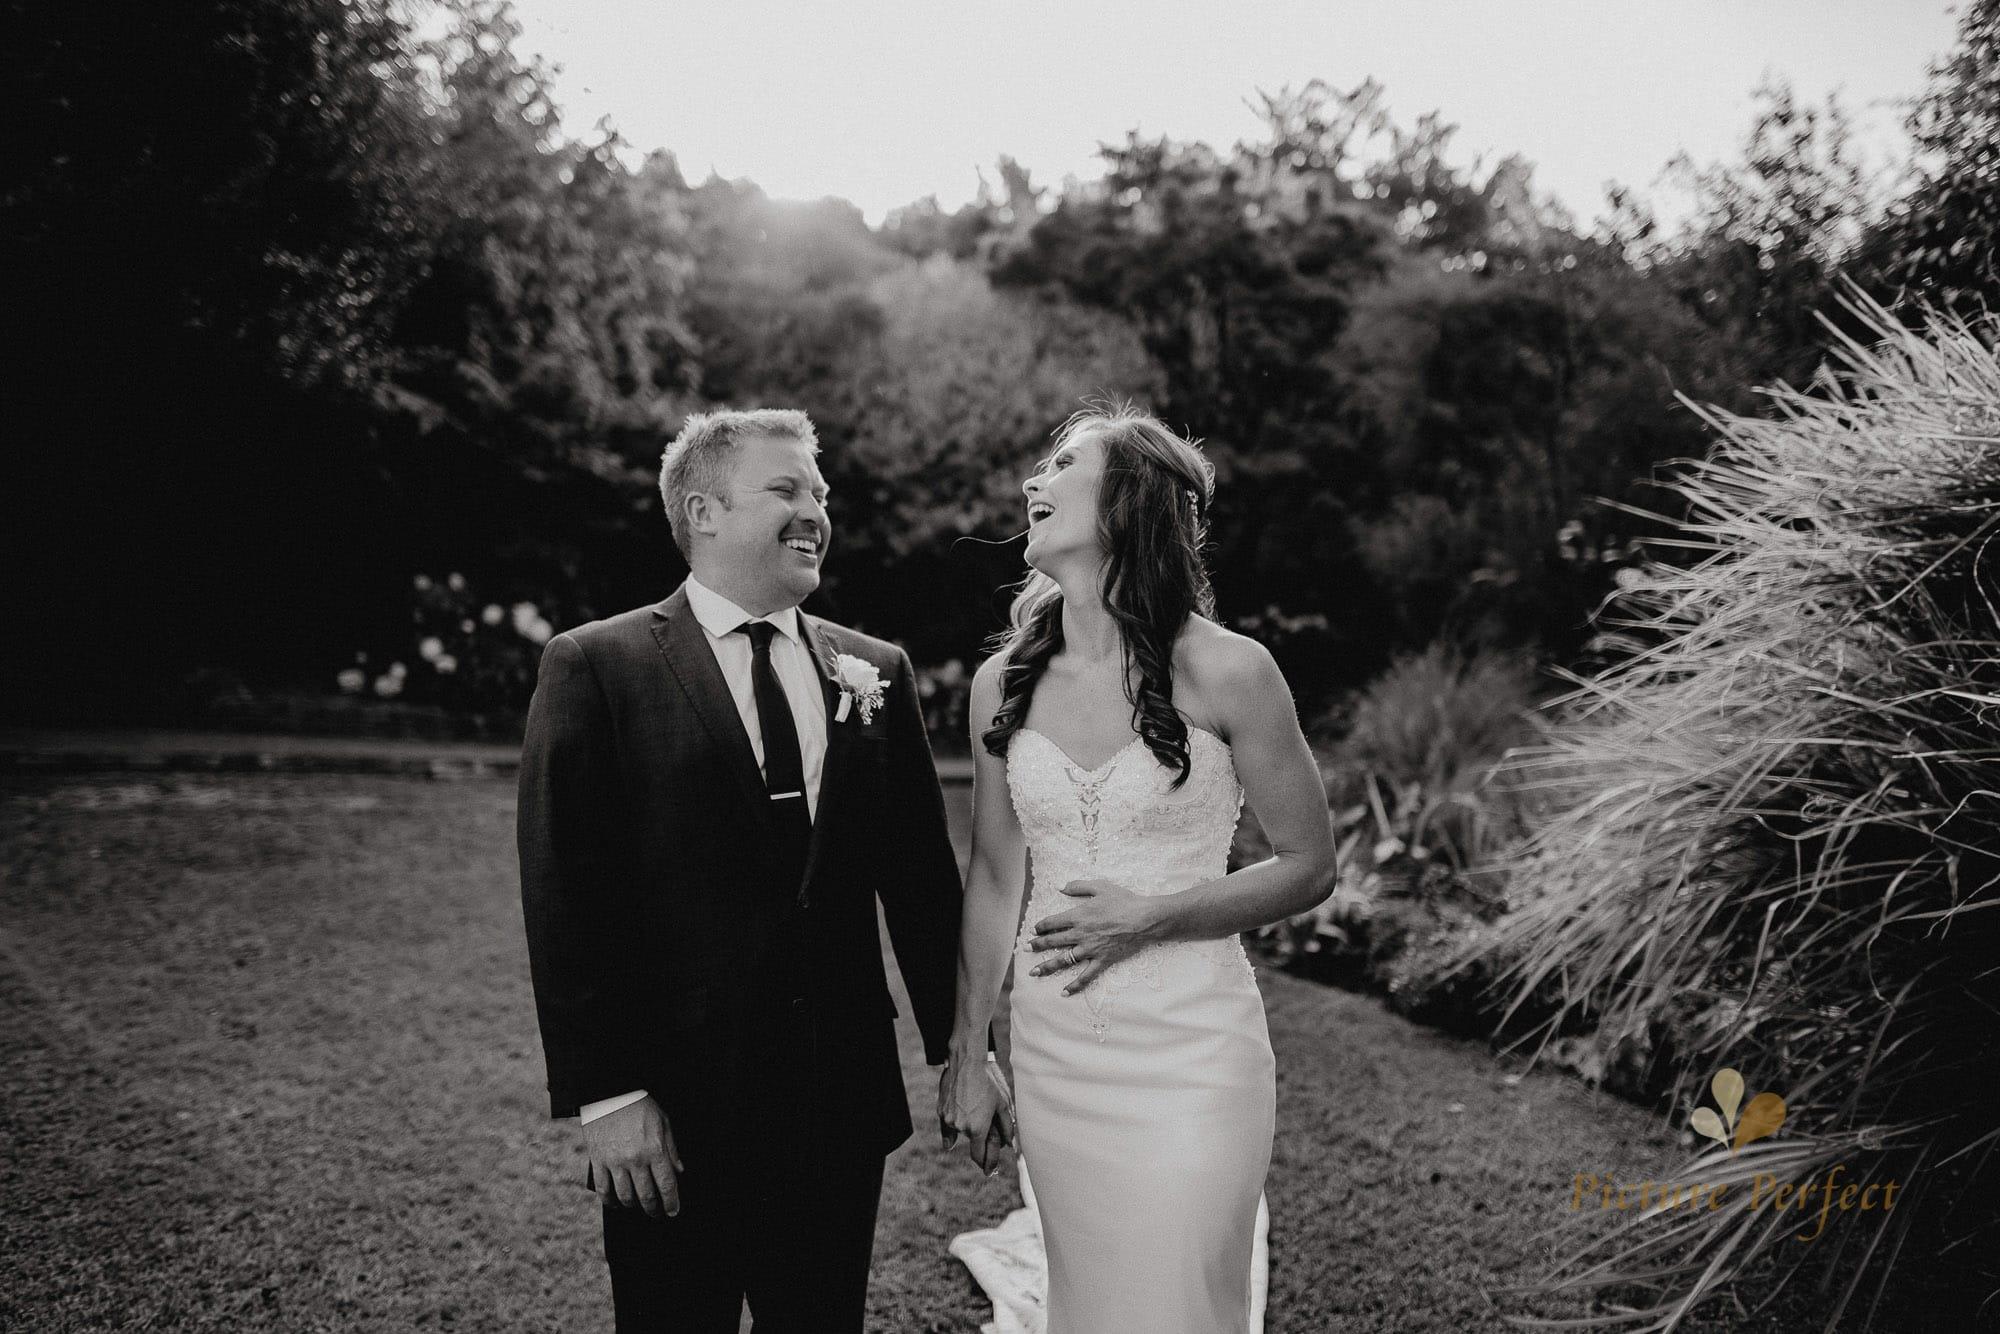 Roseburb Park wedding of Casey 4551